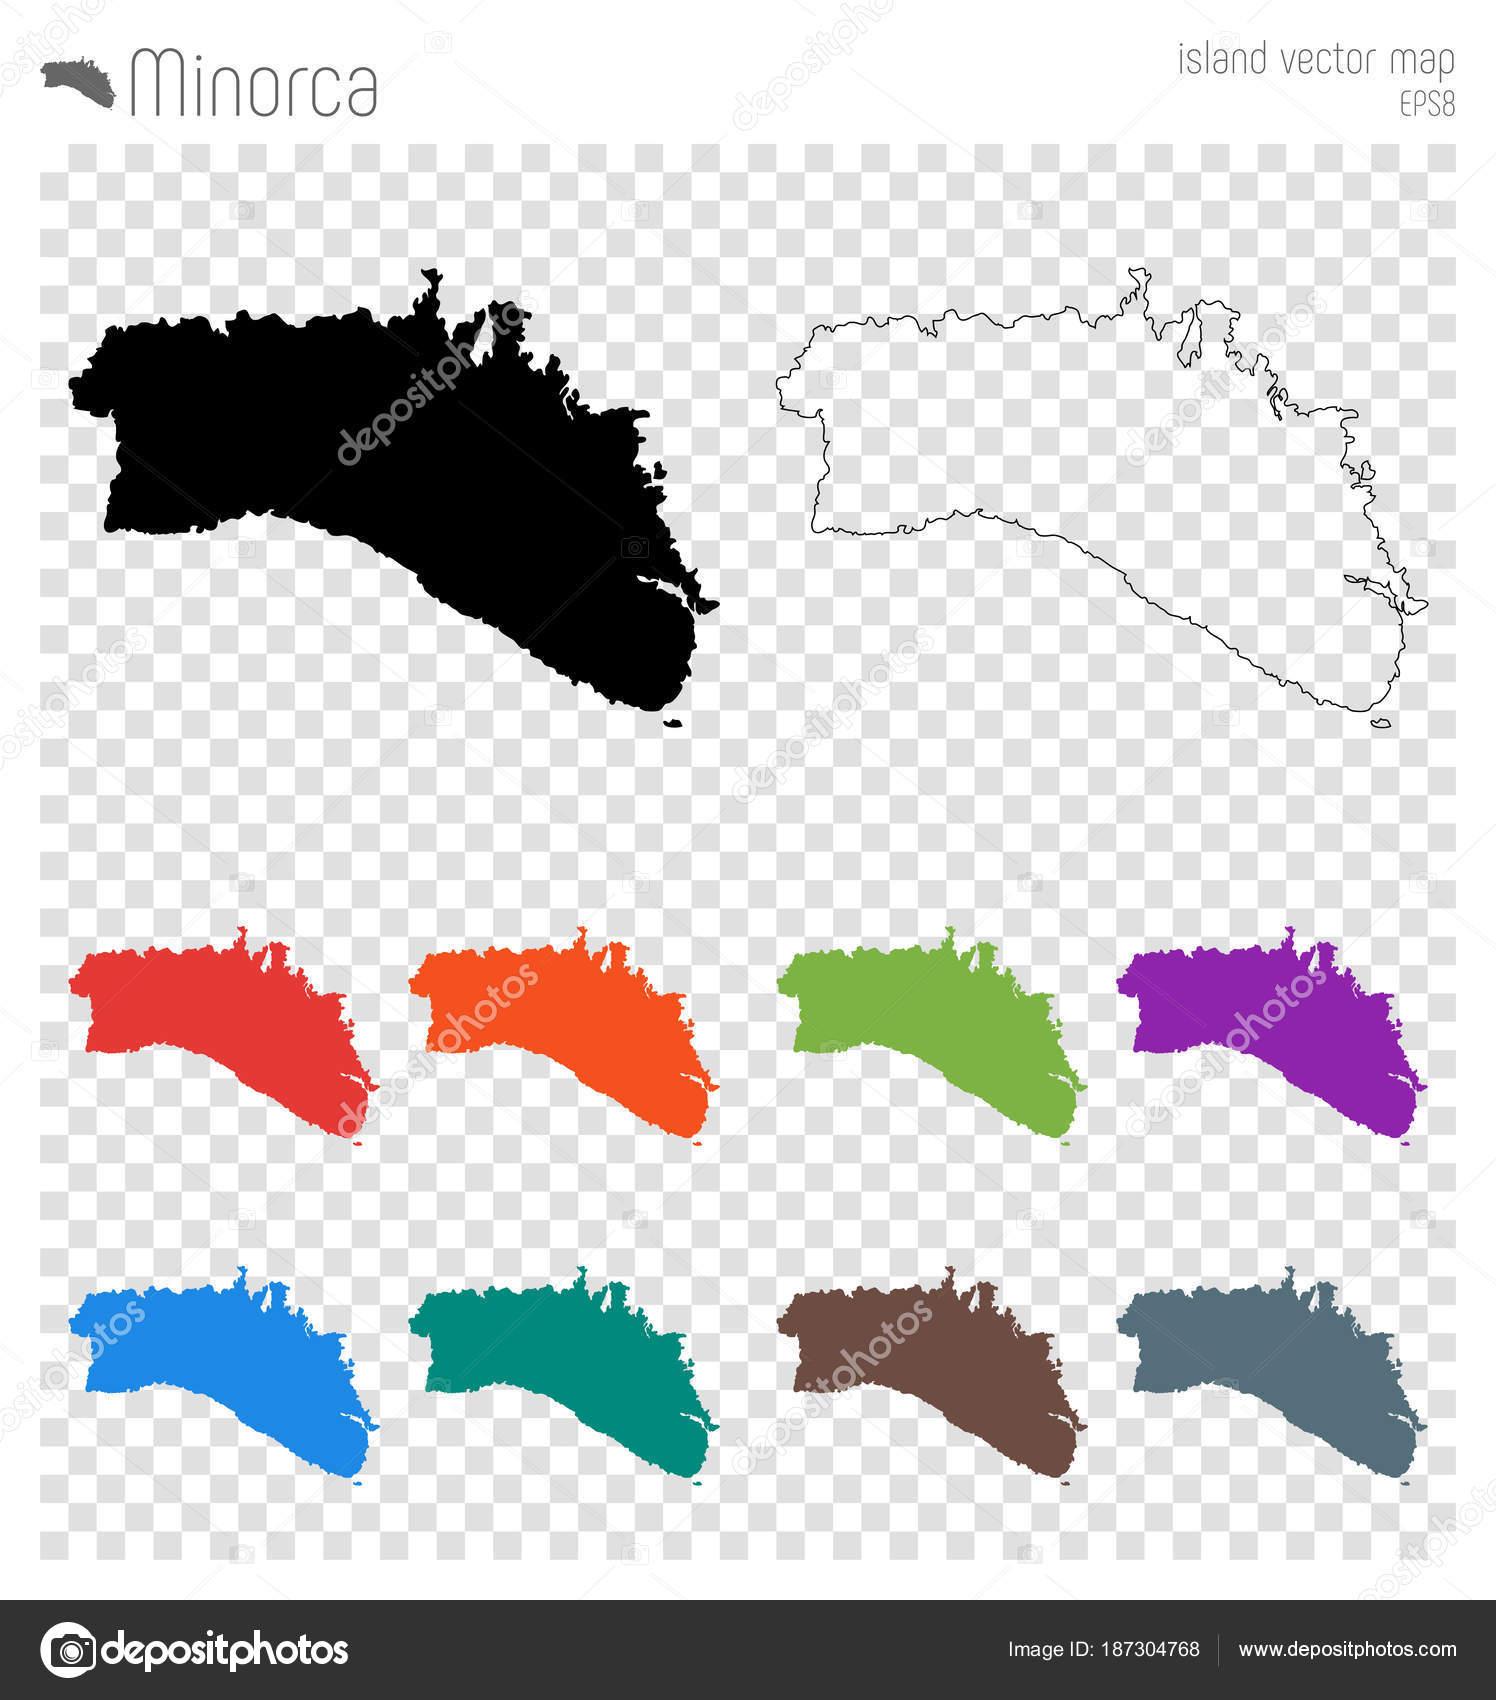 Insel Menorca Karte.Minorca Hoch Detaillierte Karte Insel Silhouette Symbol